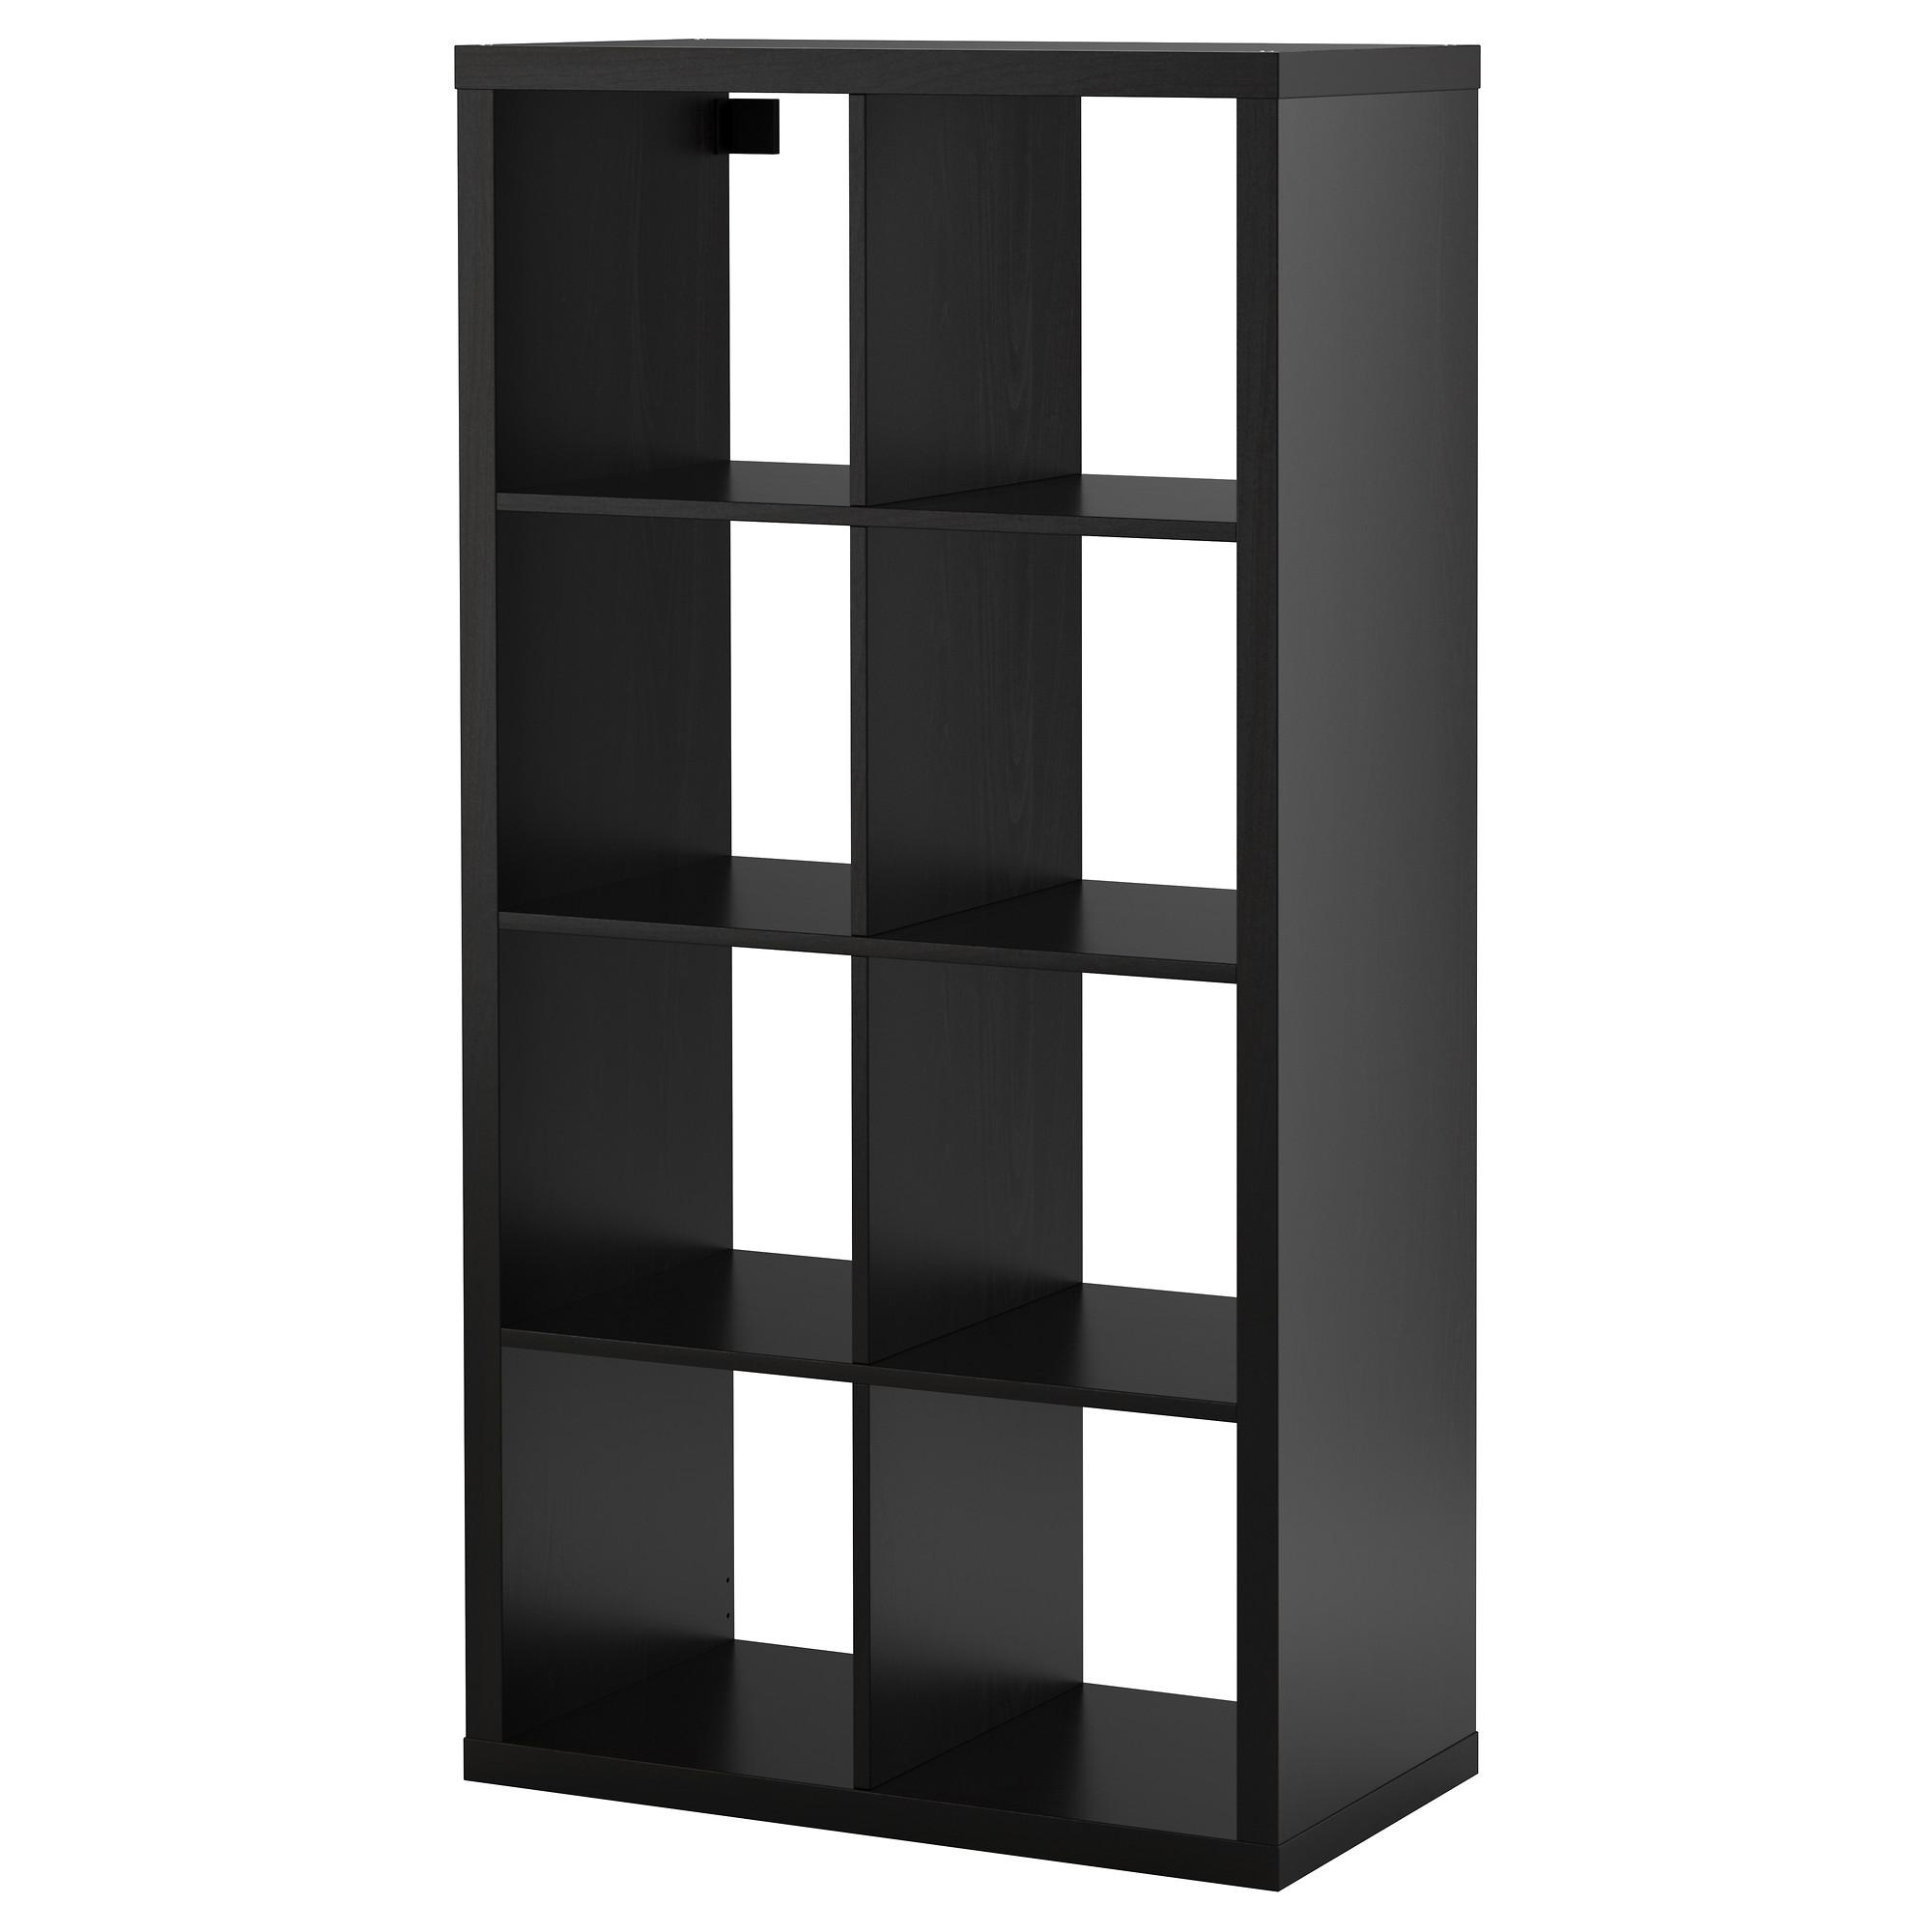 shelving units kallax shelf unit - black-brown - ikea YTIDSHV